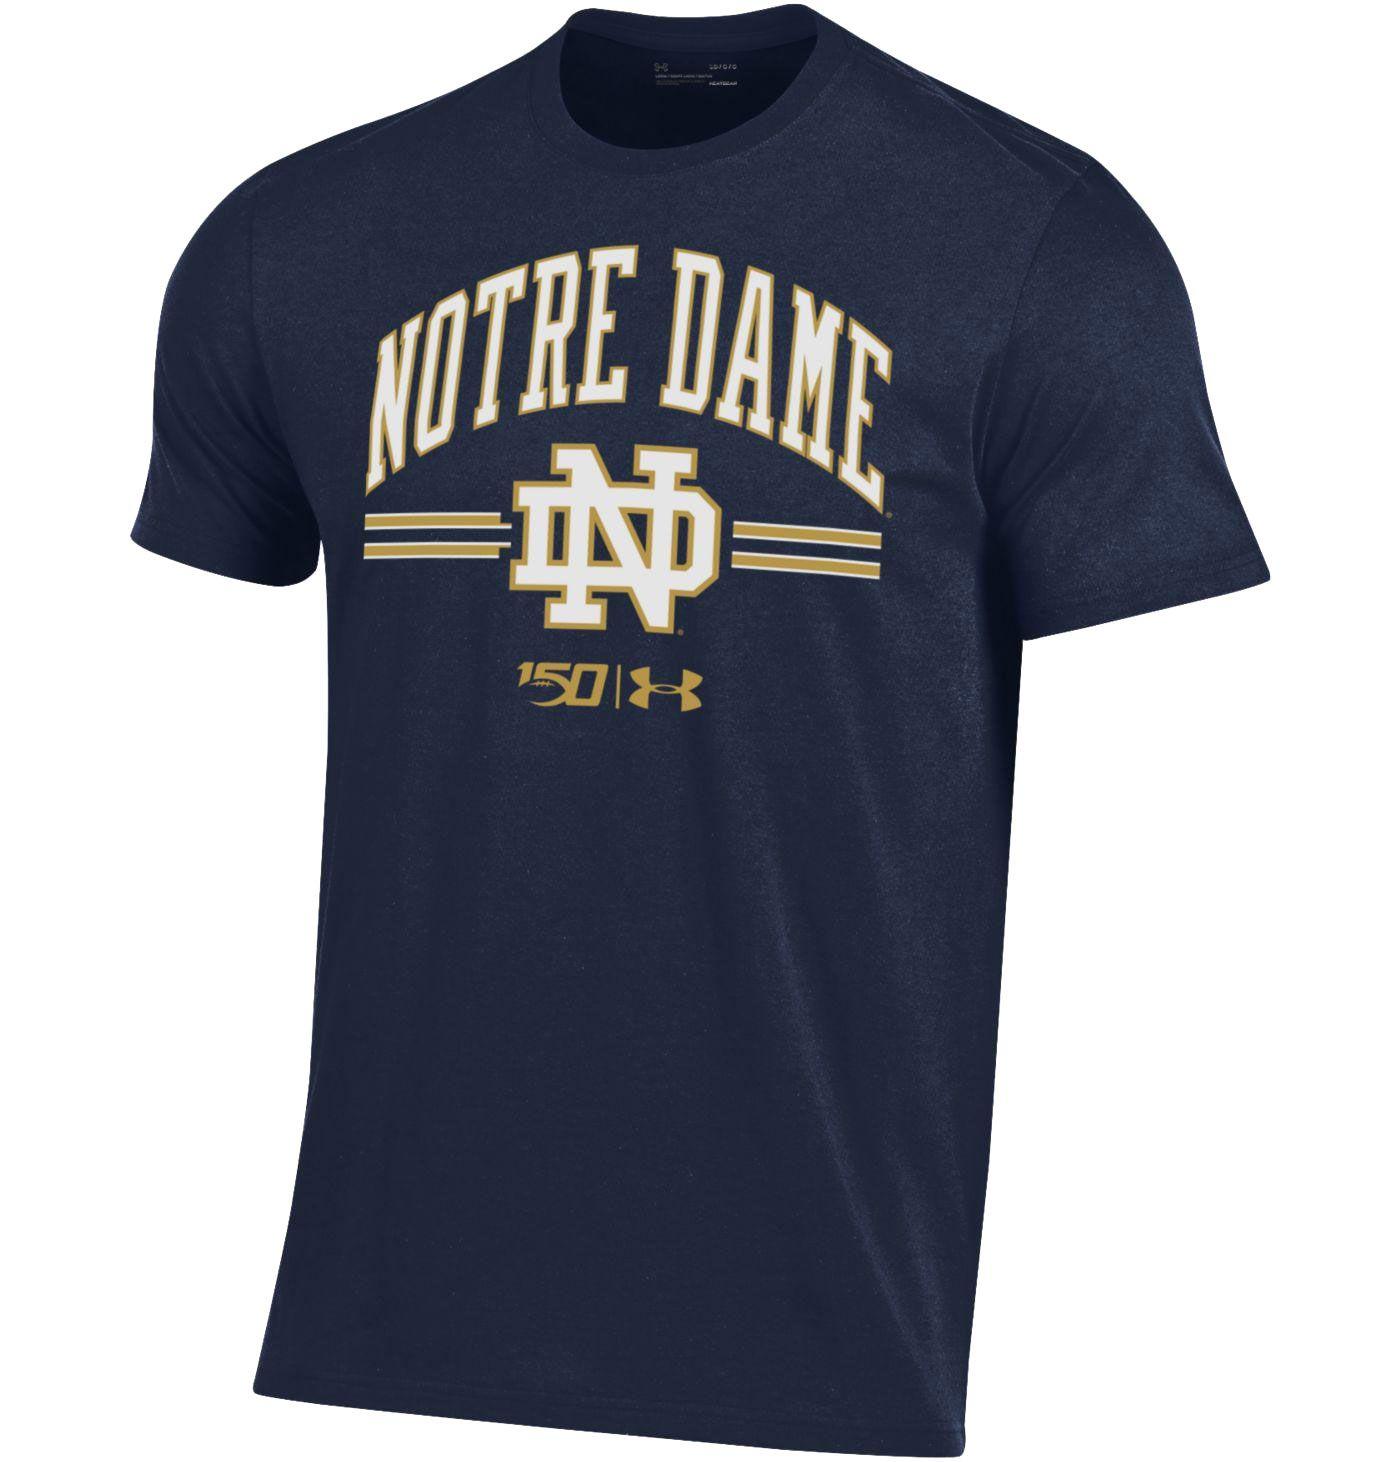 Under Armour Men's Notre Dame Fighting Irish Navy 'CFB150' Performance Cotton Football T-Shirt